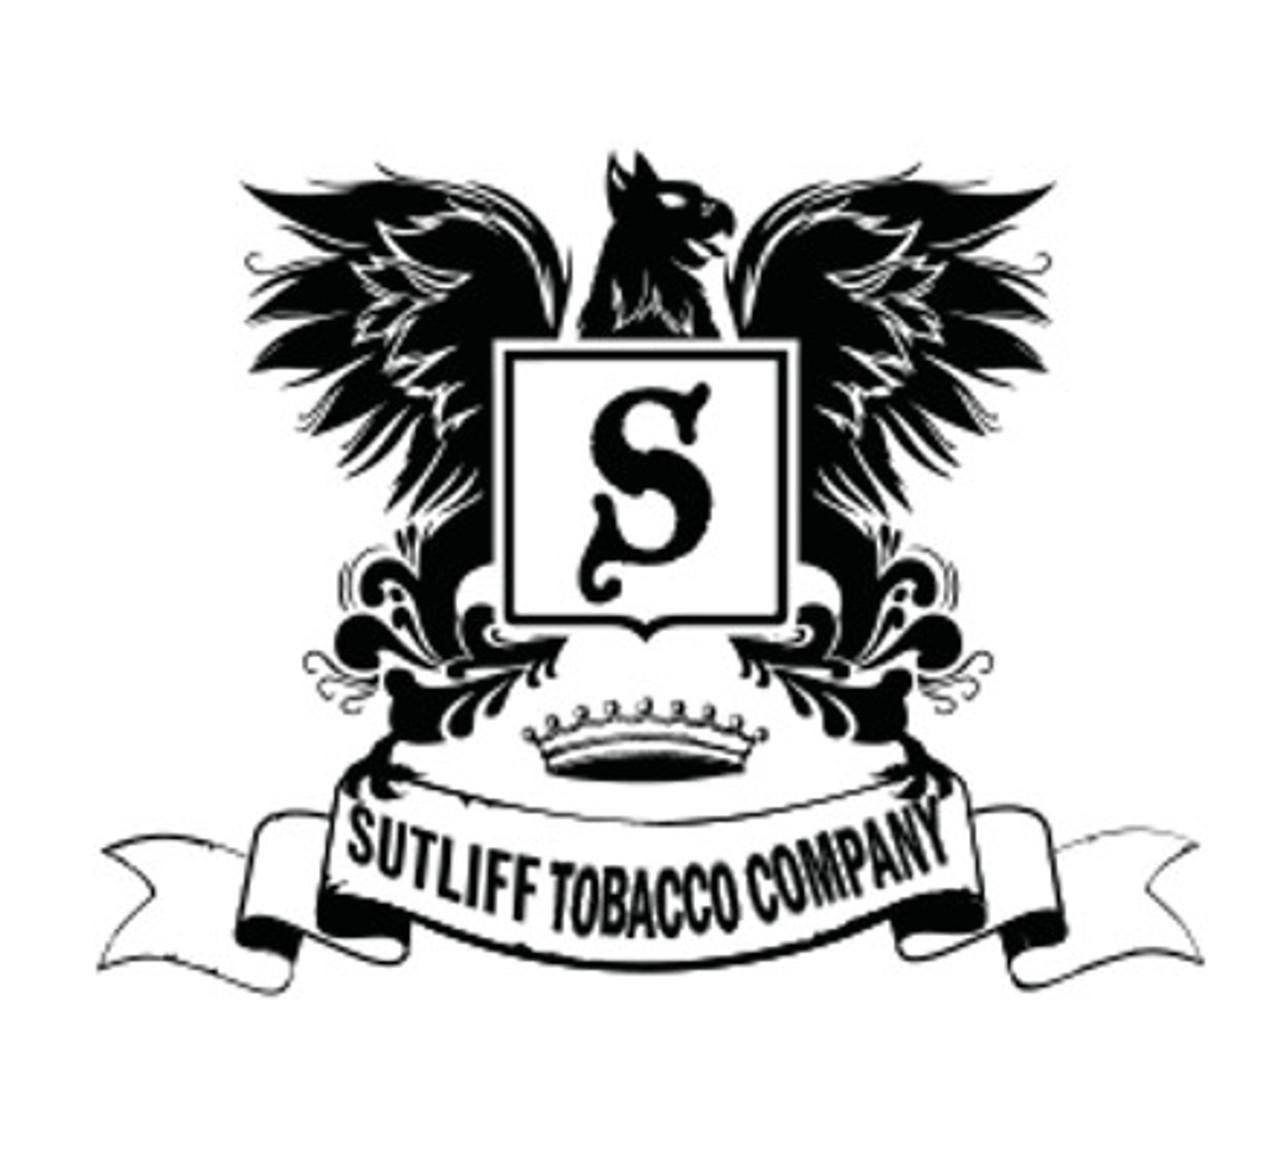 Sutliff Red Virginia Ribbon Bulk Pipe Tobacco 5 LB